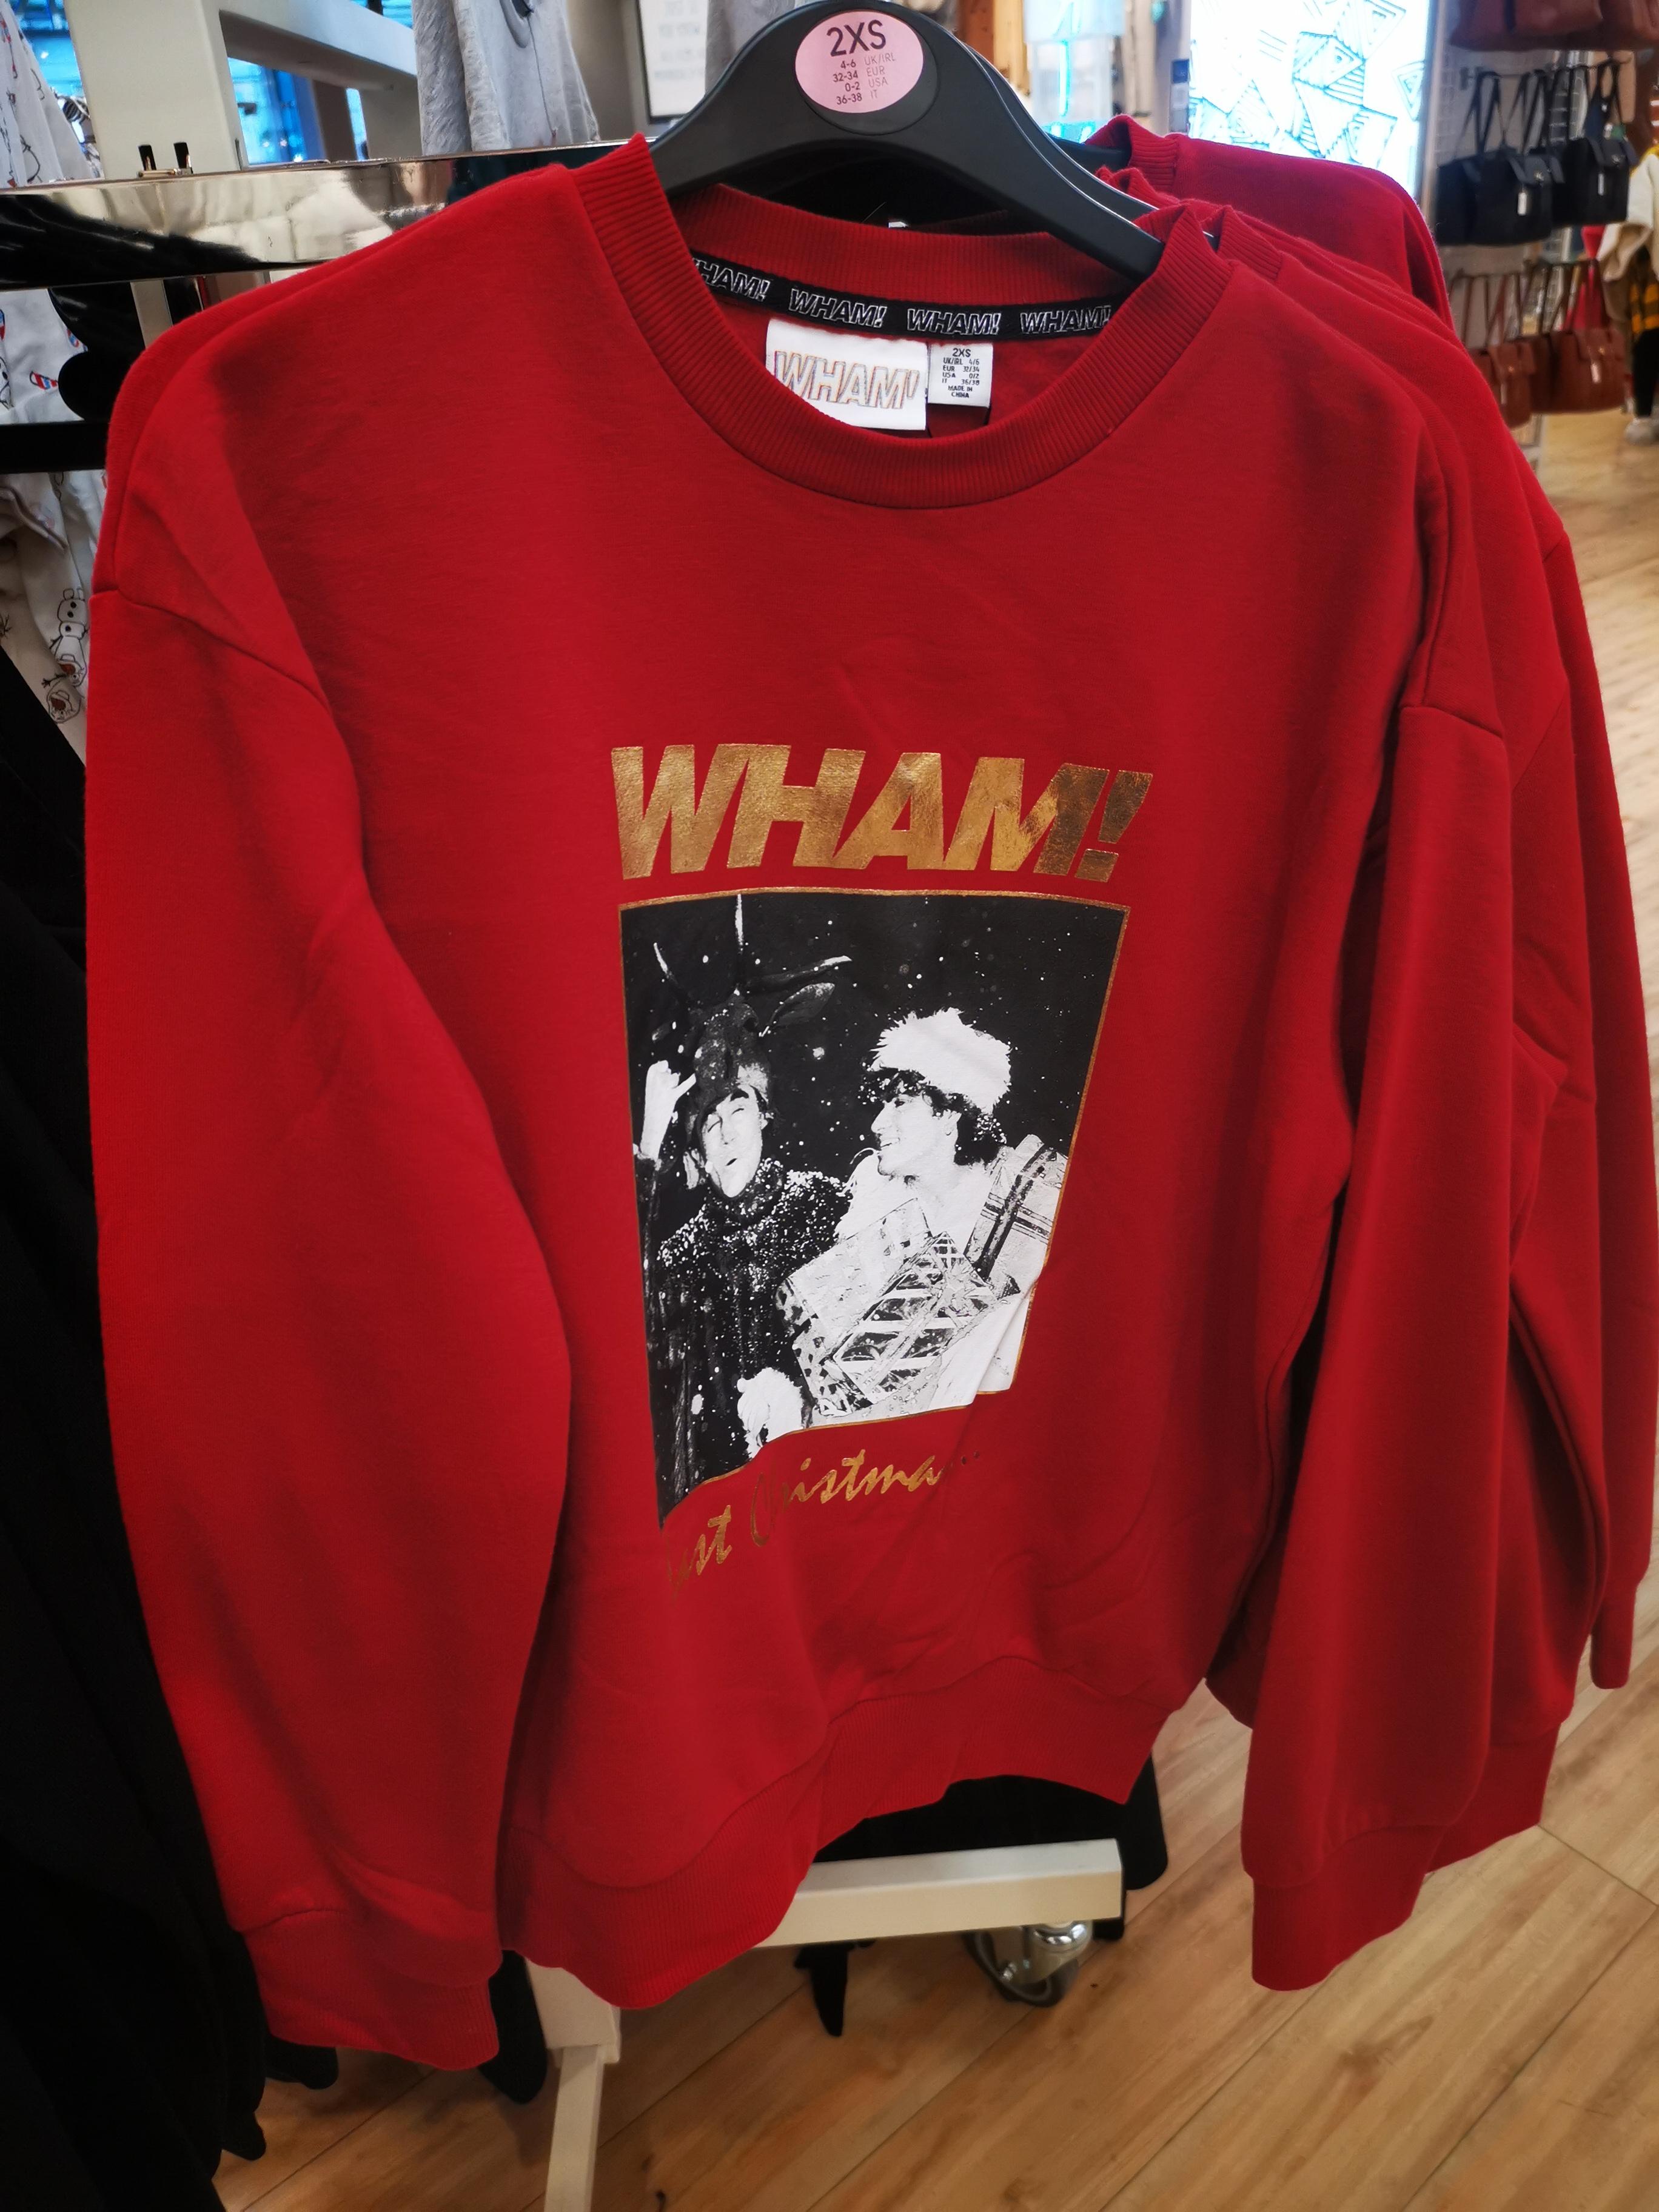 Wham! Last Christmas Sweater, £10 In Store @ Primark (Argyle Street, Glasgow)